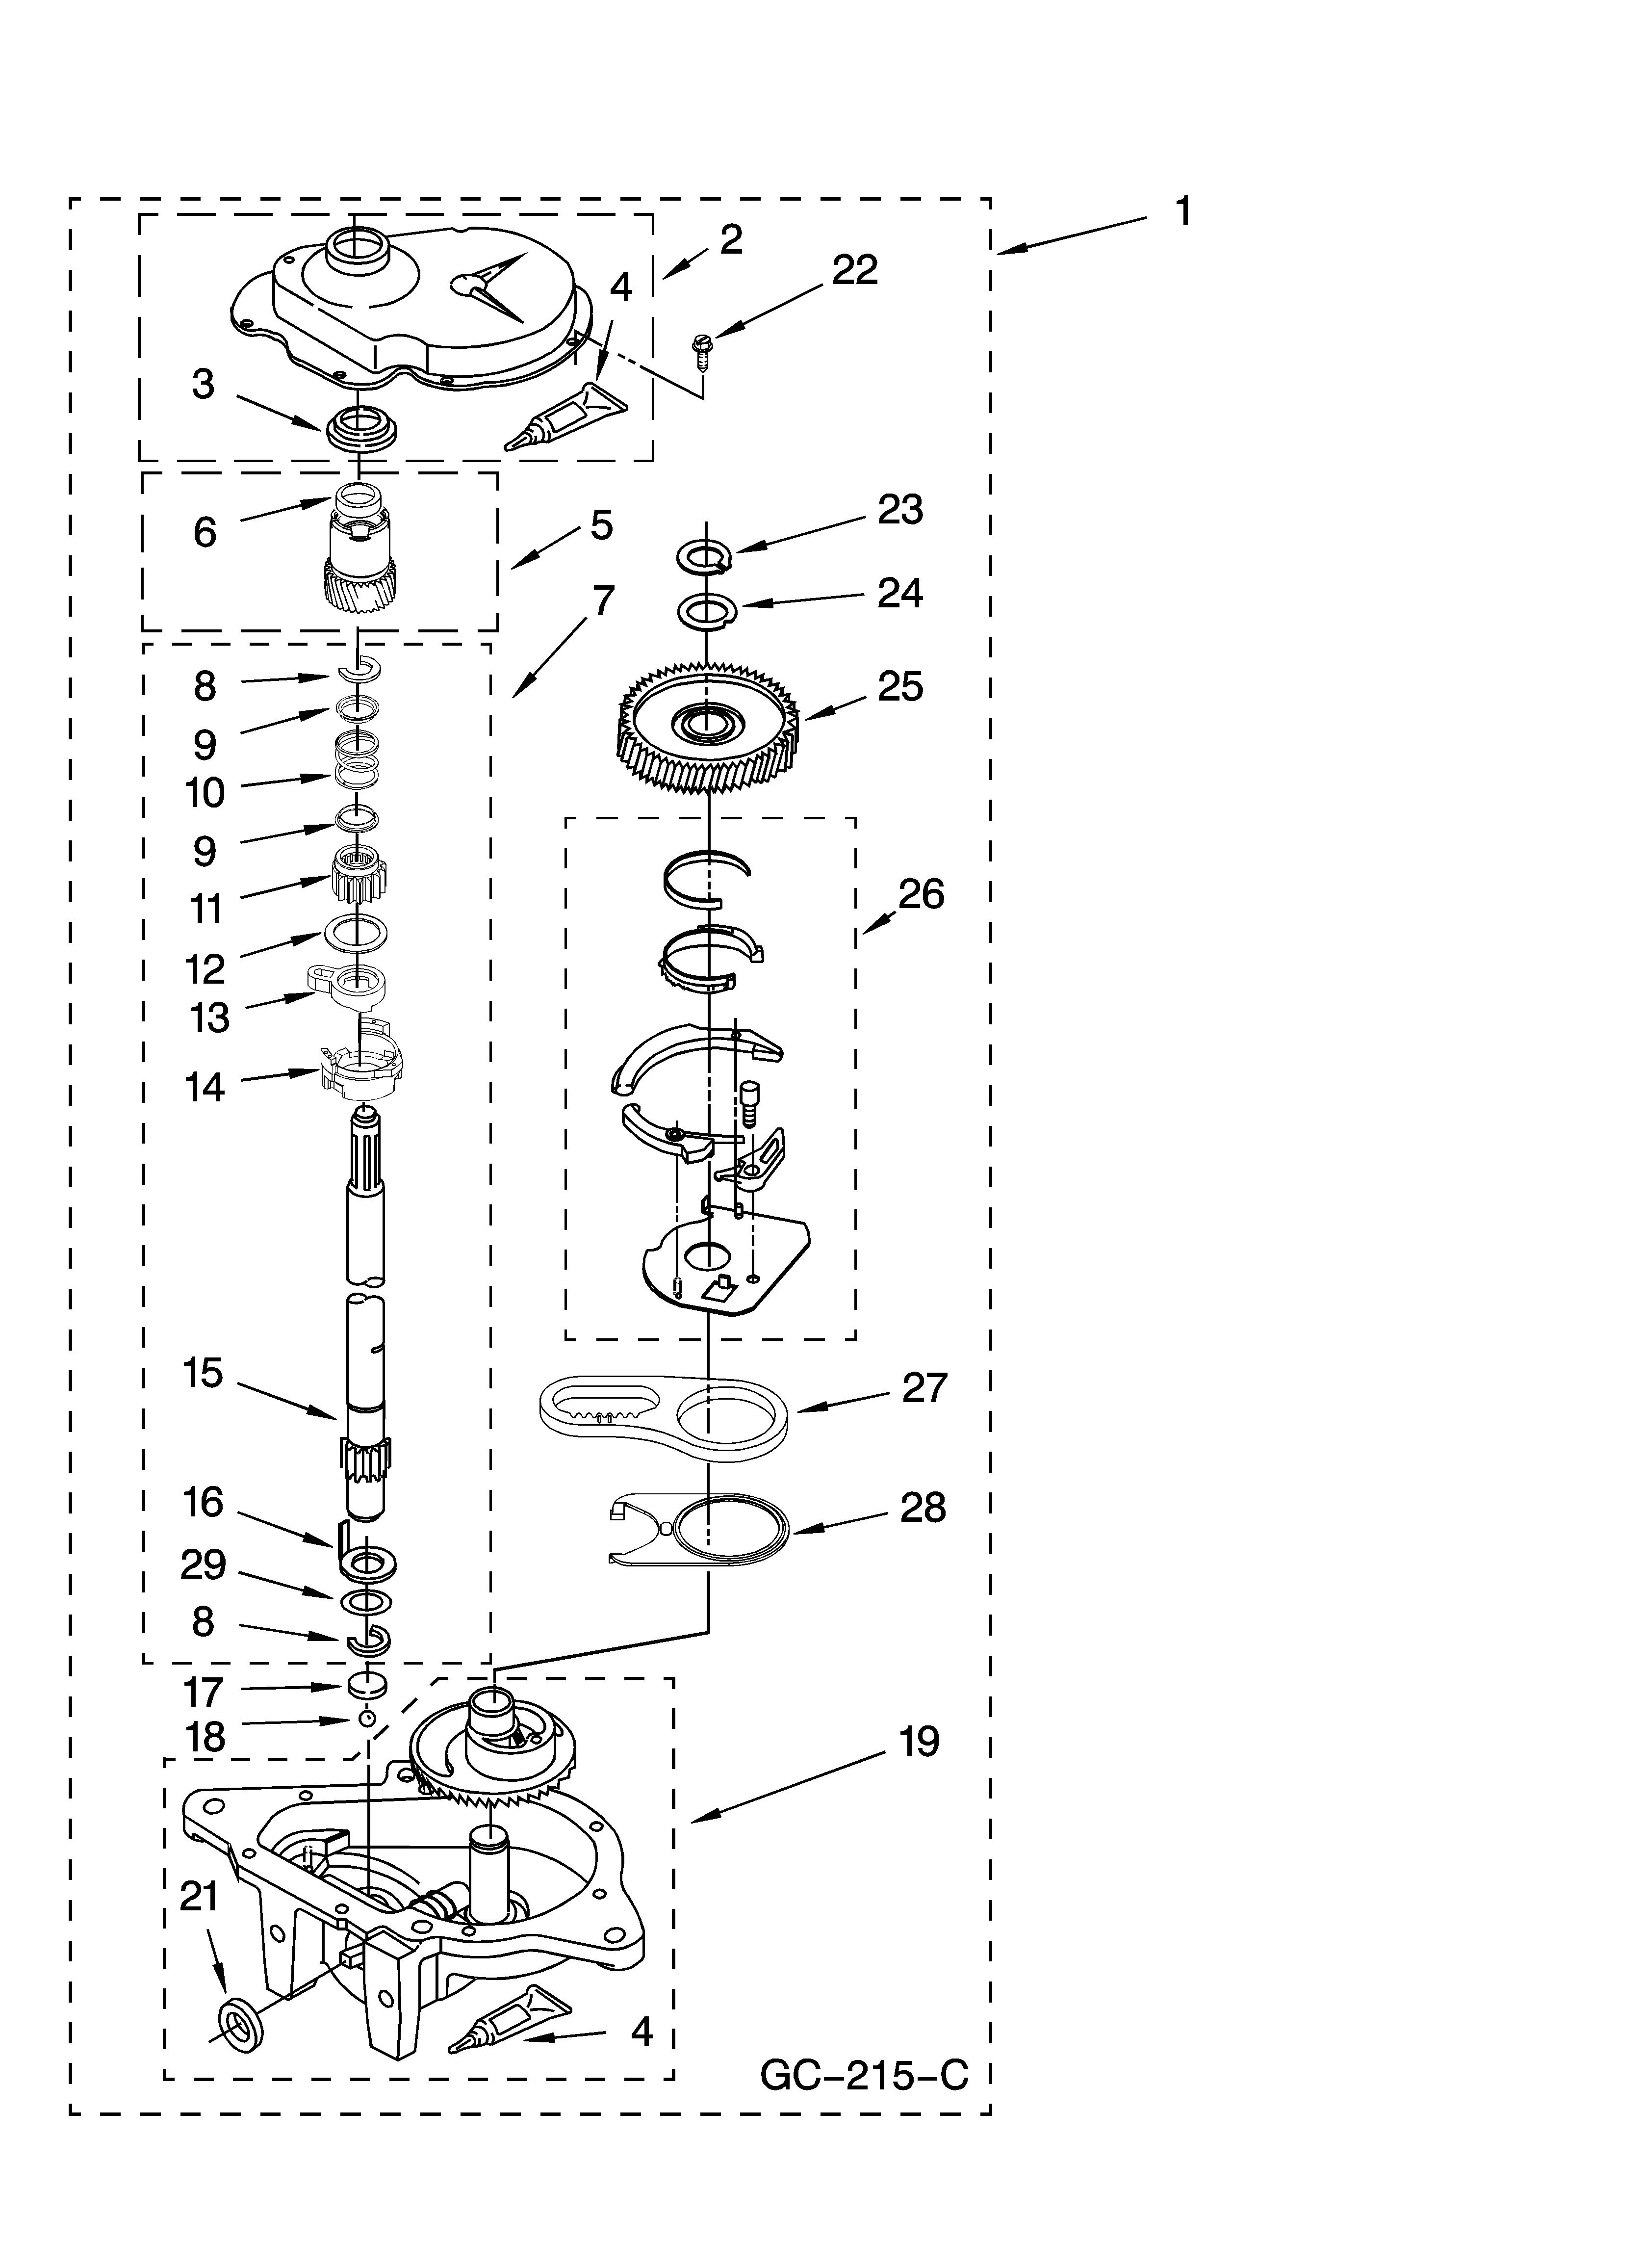 MW_7560] Washing Machine Clutch Diagram Printable Wiring Diagram Schematic  Download Diagram | Admiral Washer Wiring Diagram |  | Benkeme Stap Alia Grebs Wigeg Mohammedshrine Librar Wiring 101